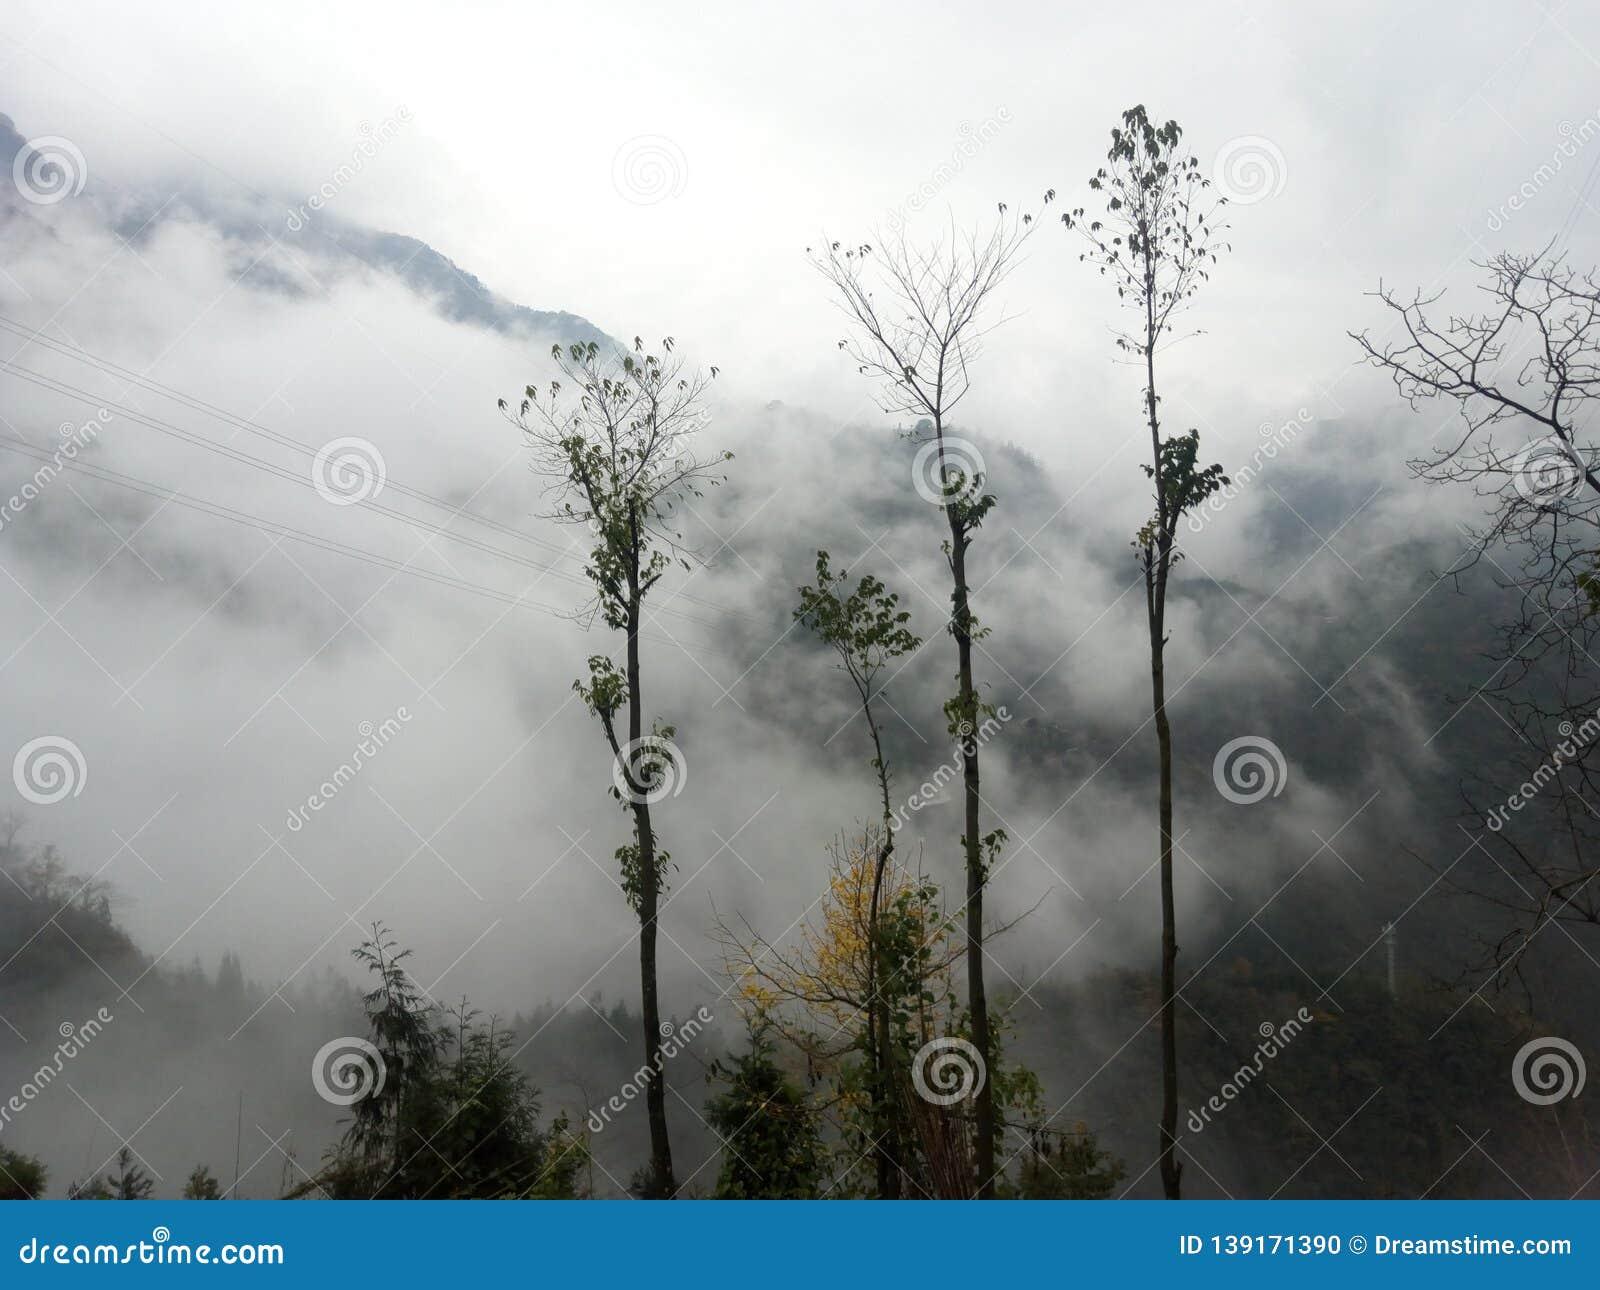 Mountain clouds, clouds like fog